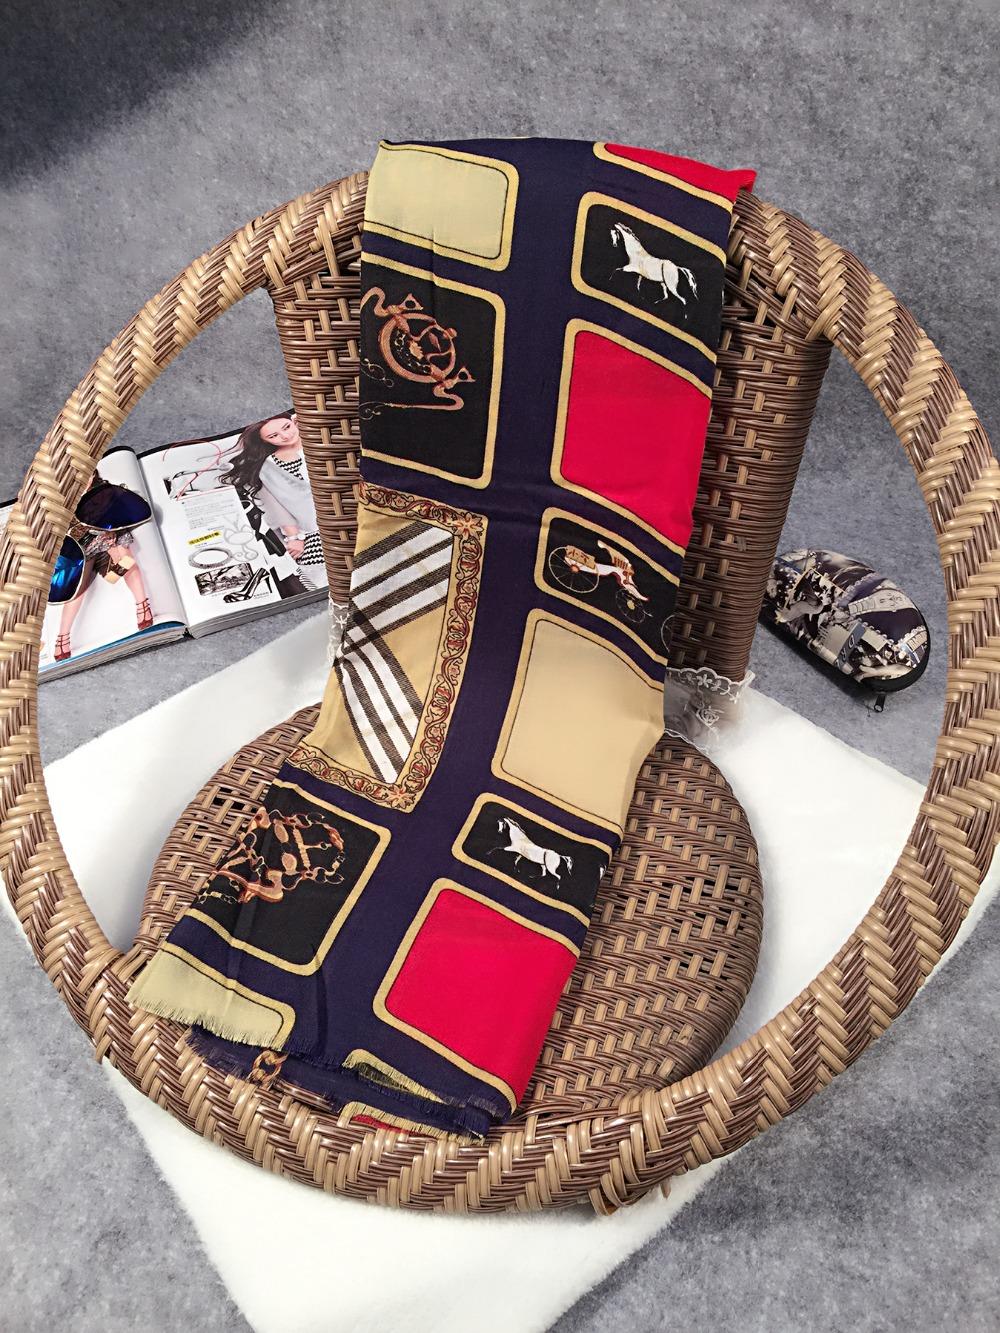 2015 New Fashion European American Famous Brand Scarf Cheap Winter Wrap Scarves Fine Voile Silk Shawl Printed Pashmina(China (Mainland))